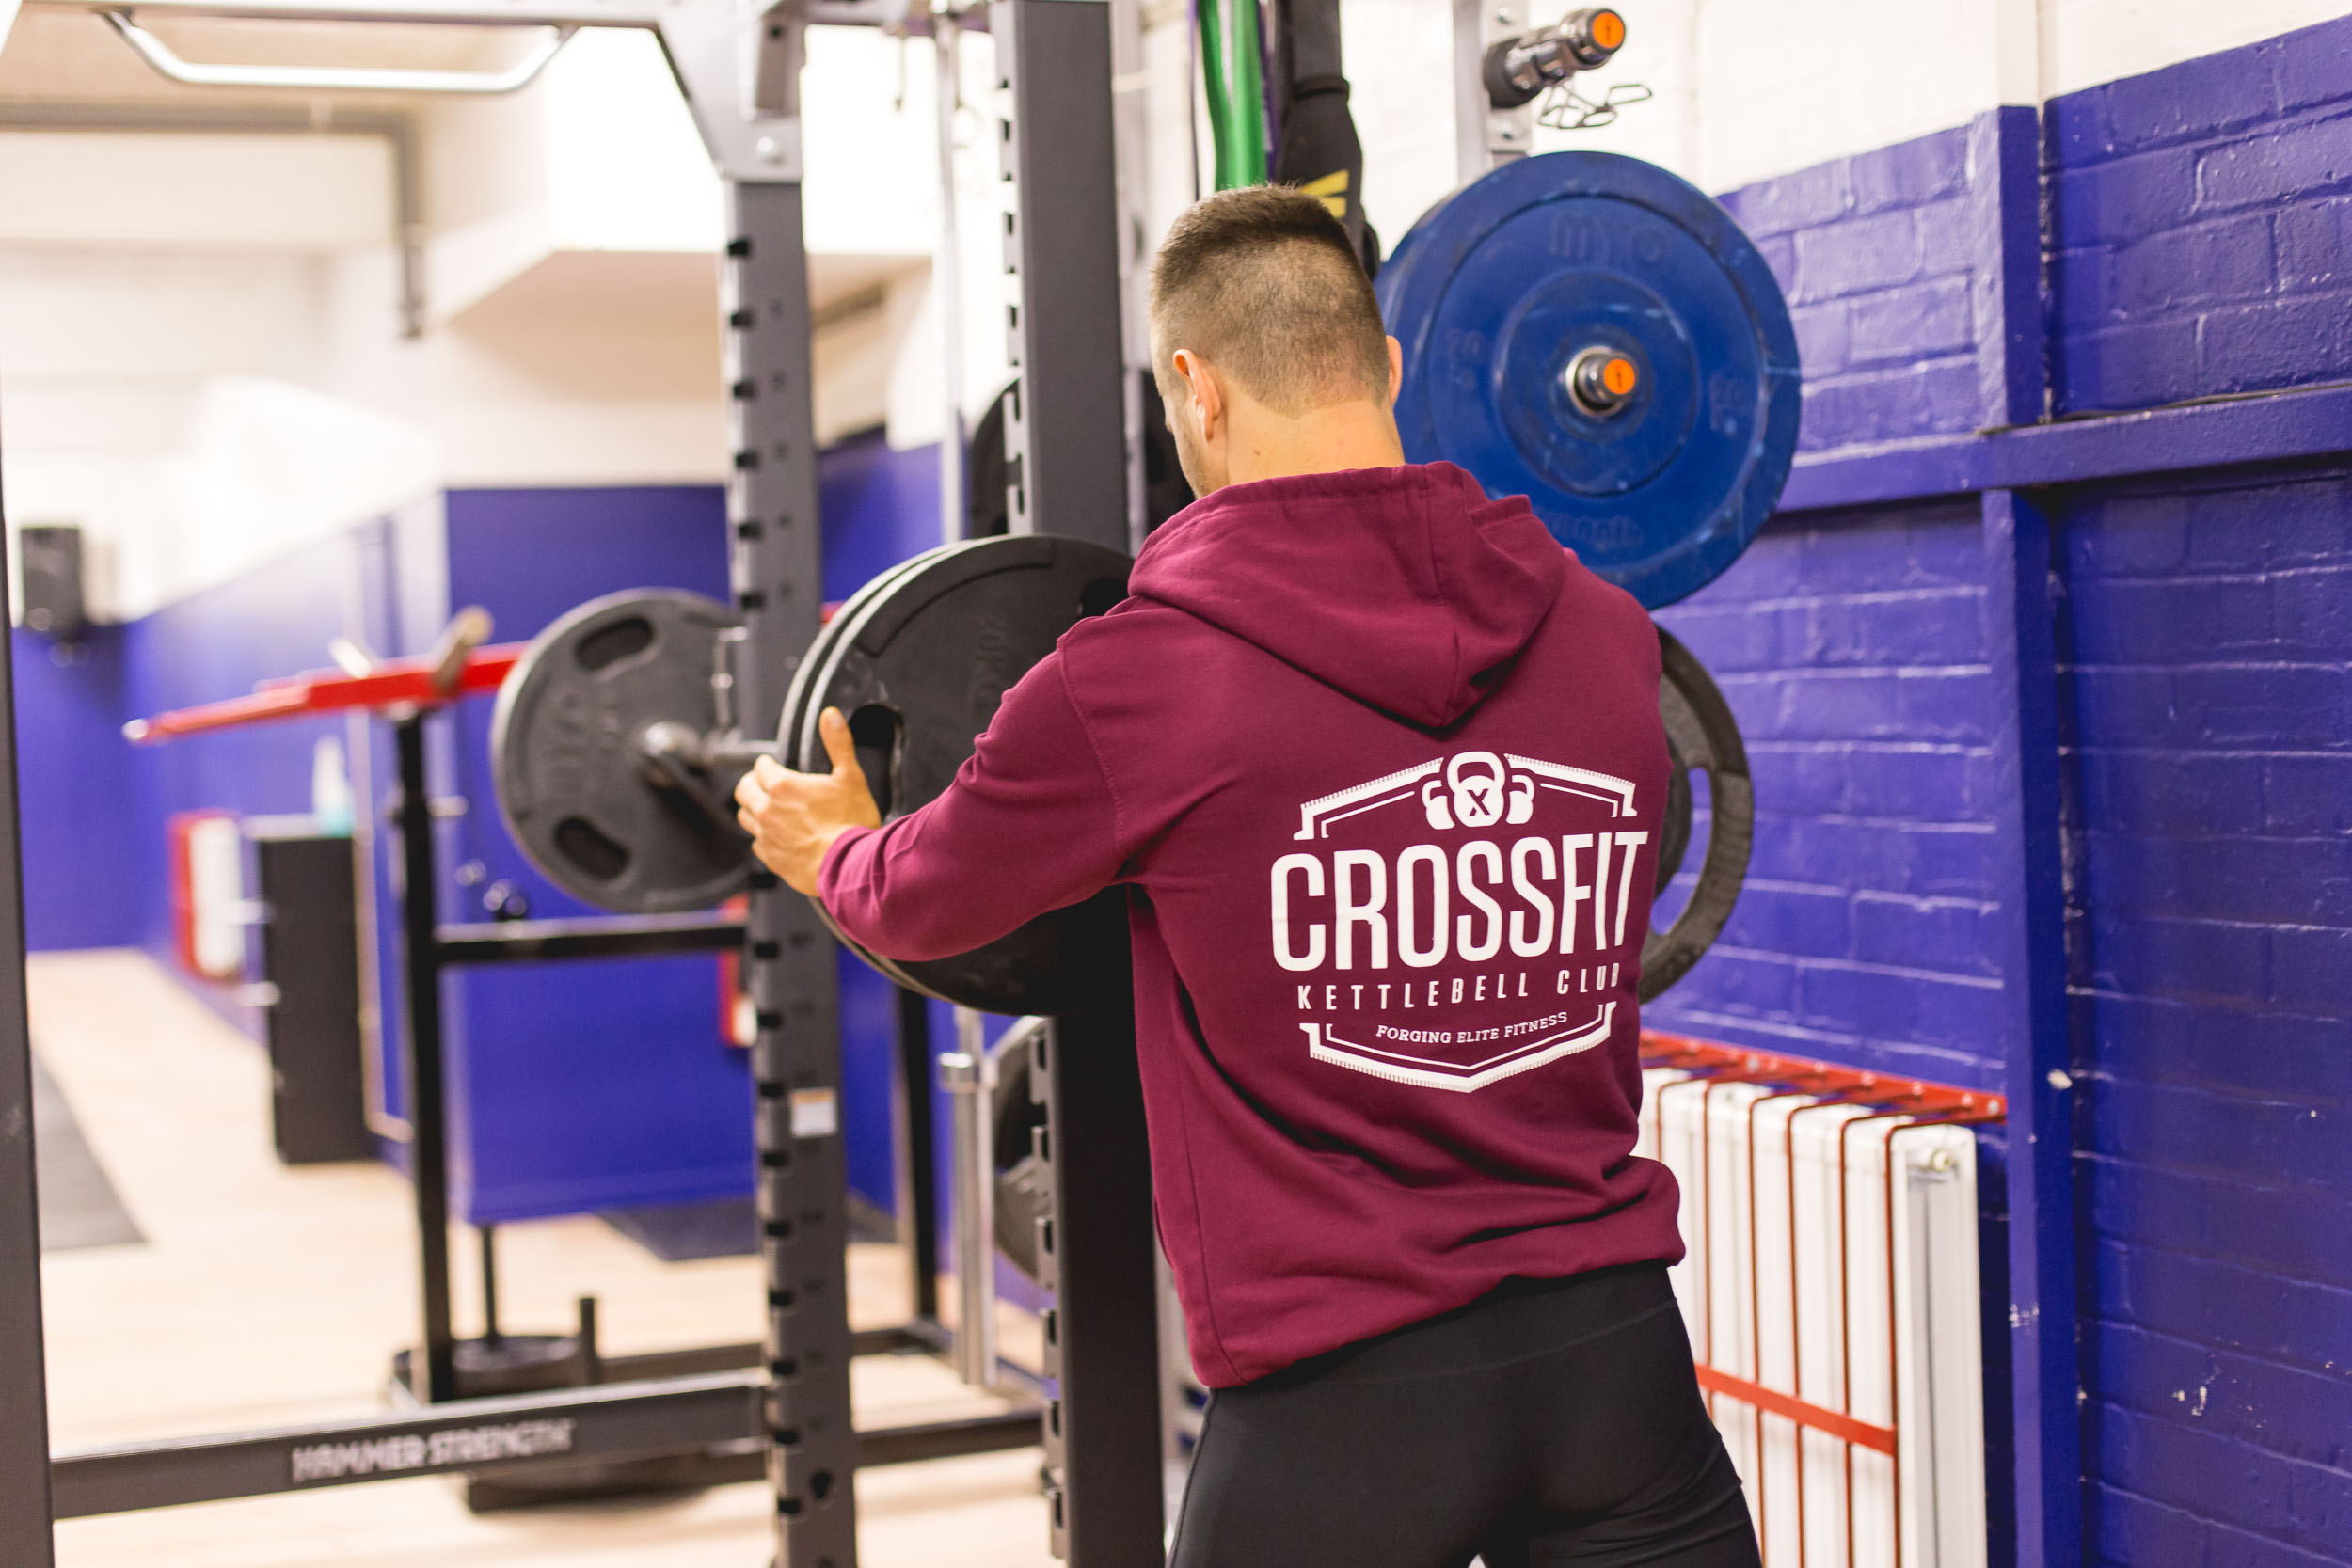 Crossfit UK printed clothing t-shirts-0003.jpg